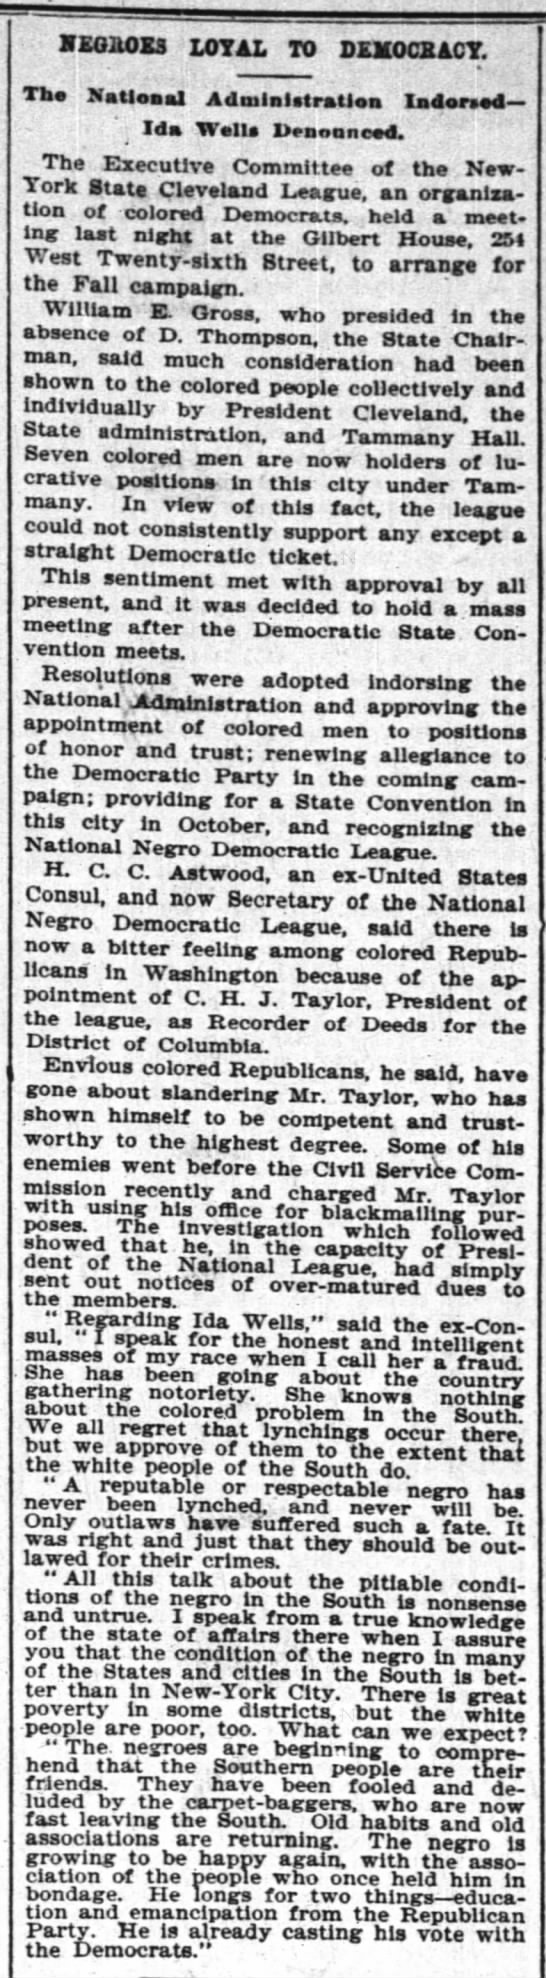 1894-09-04-NewYorkTimes-p1-NegroesLoyalToDemocracy -